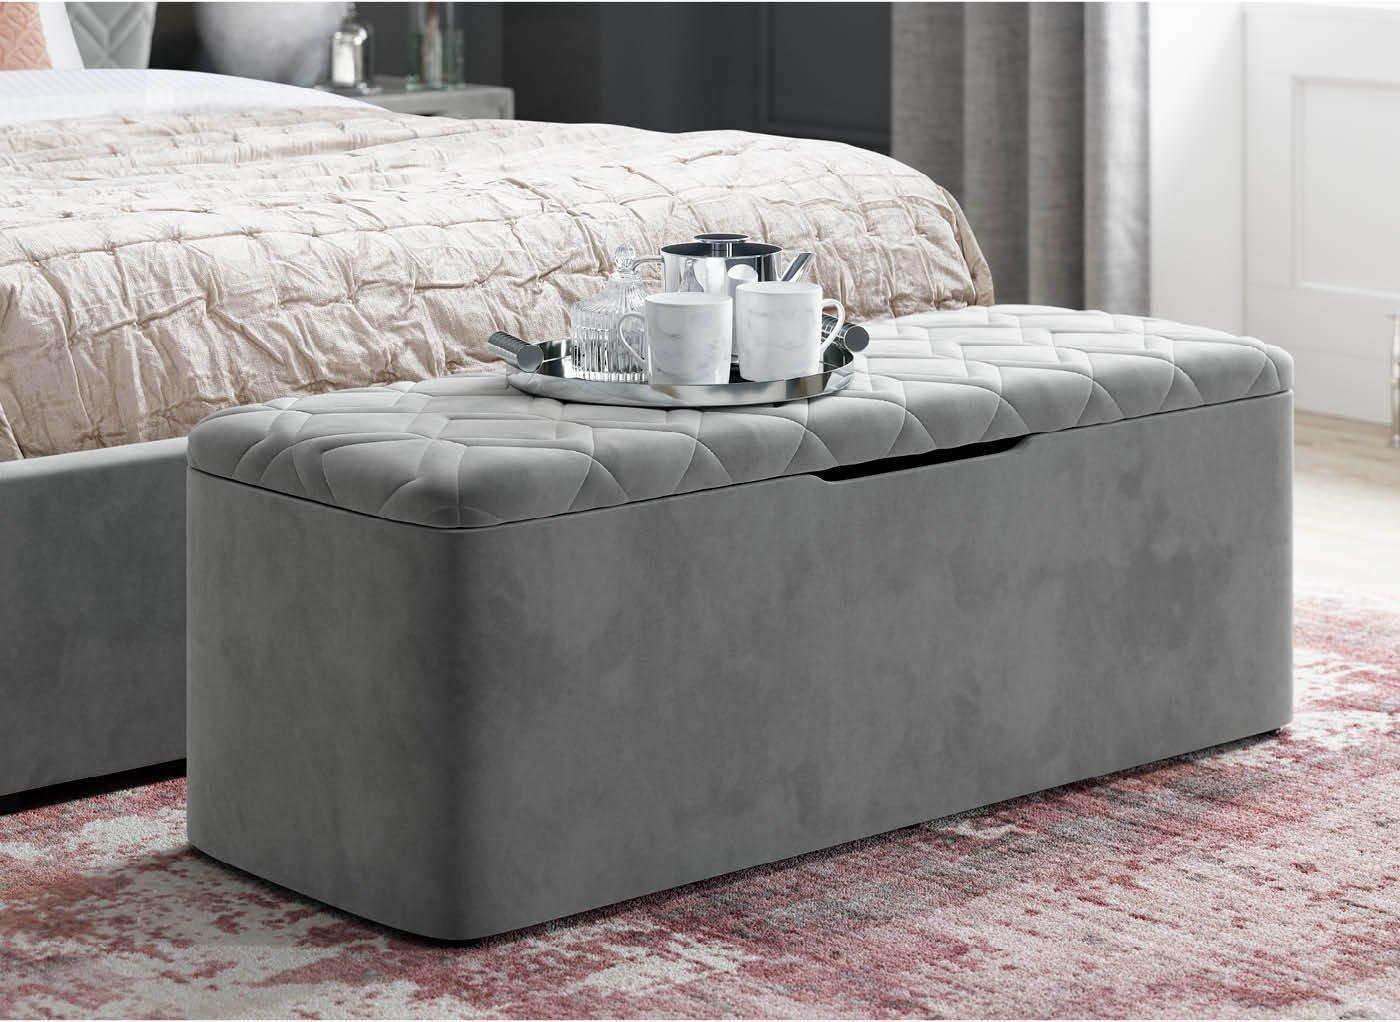 Neva Blanket Box (£249)